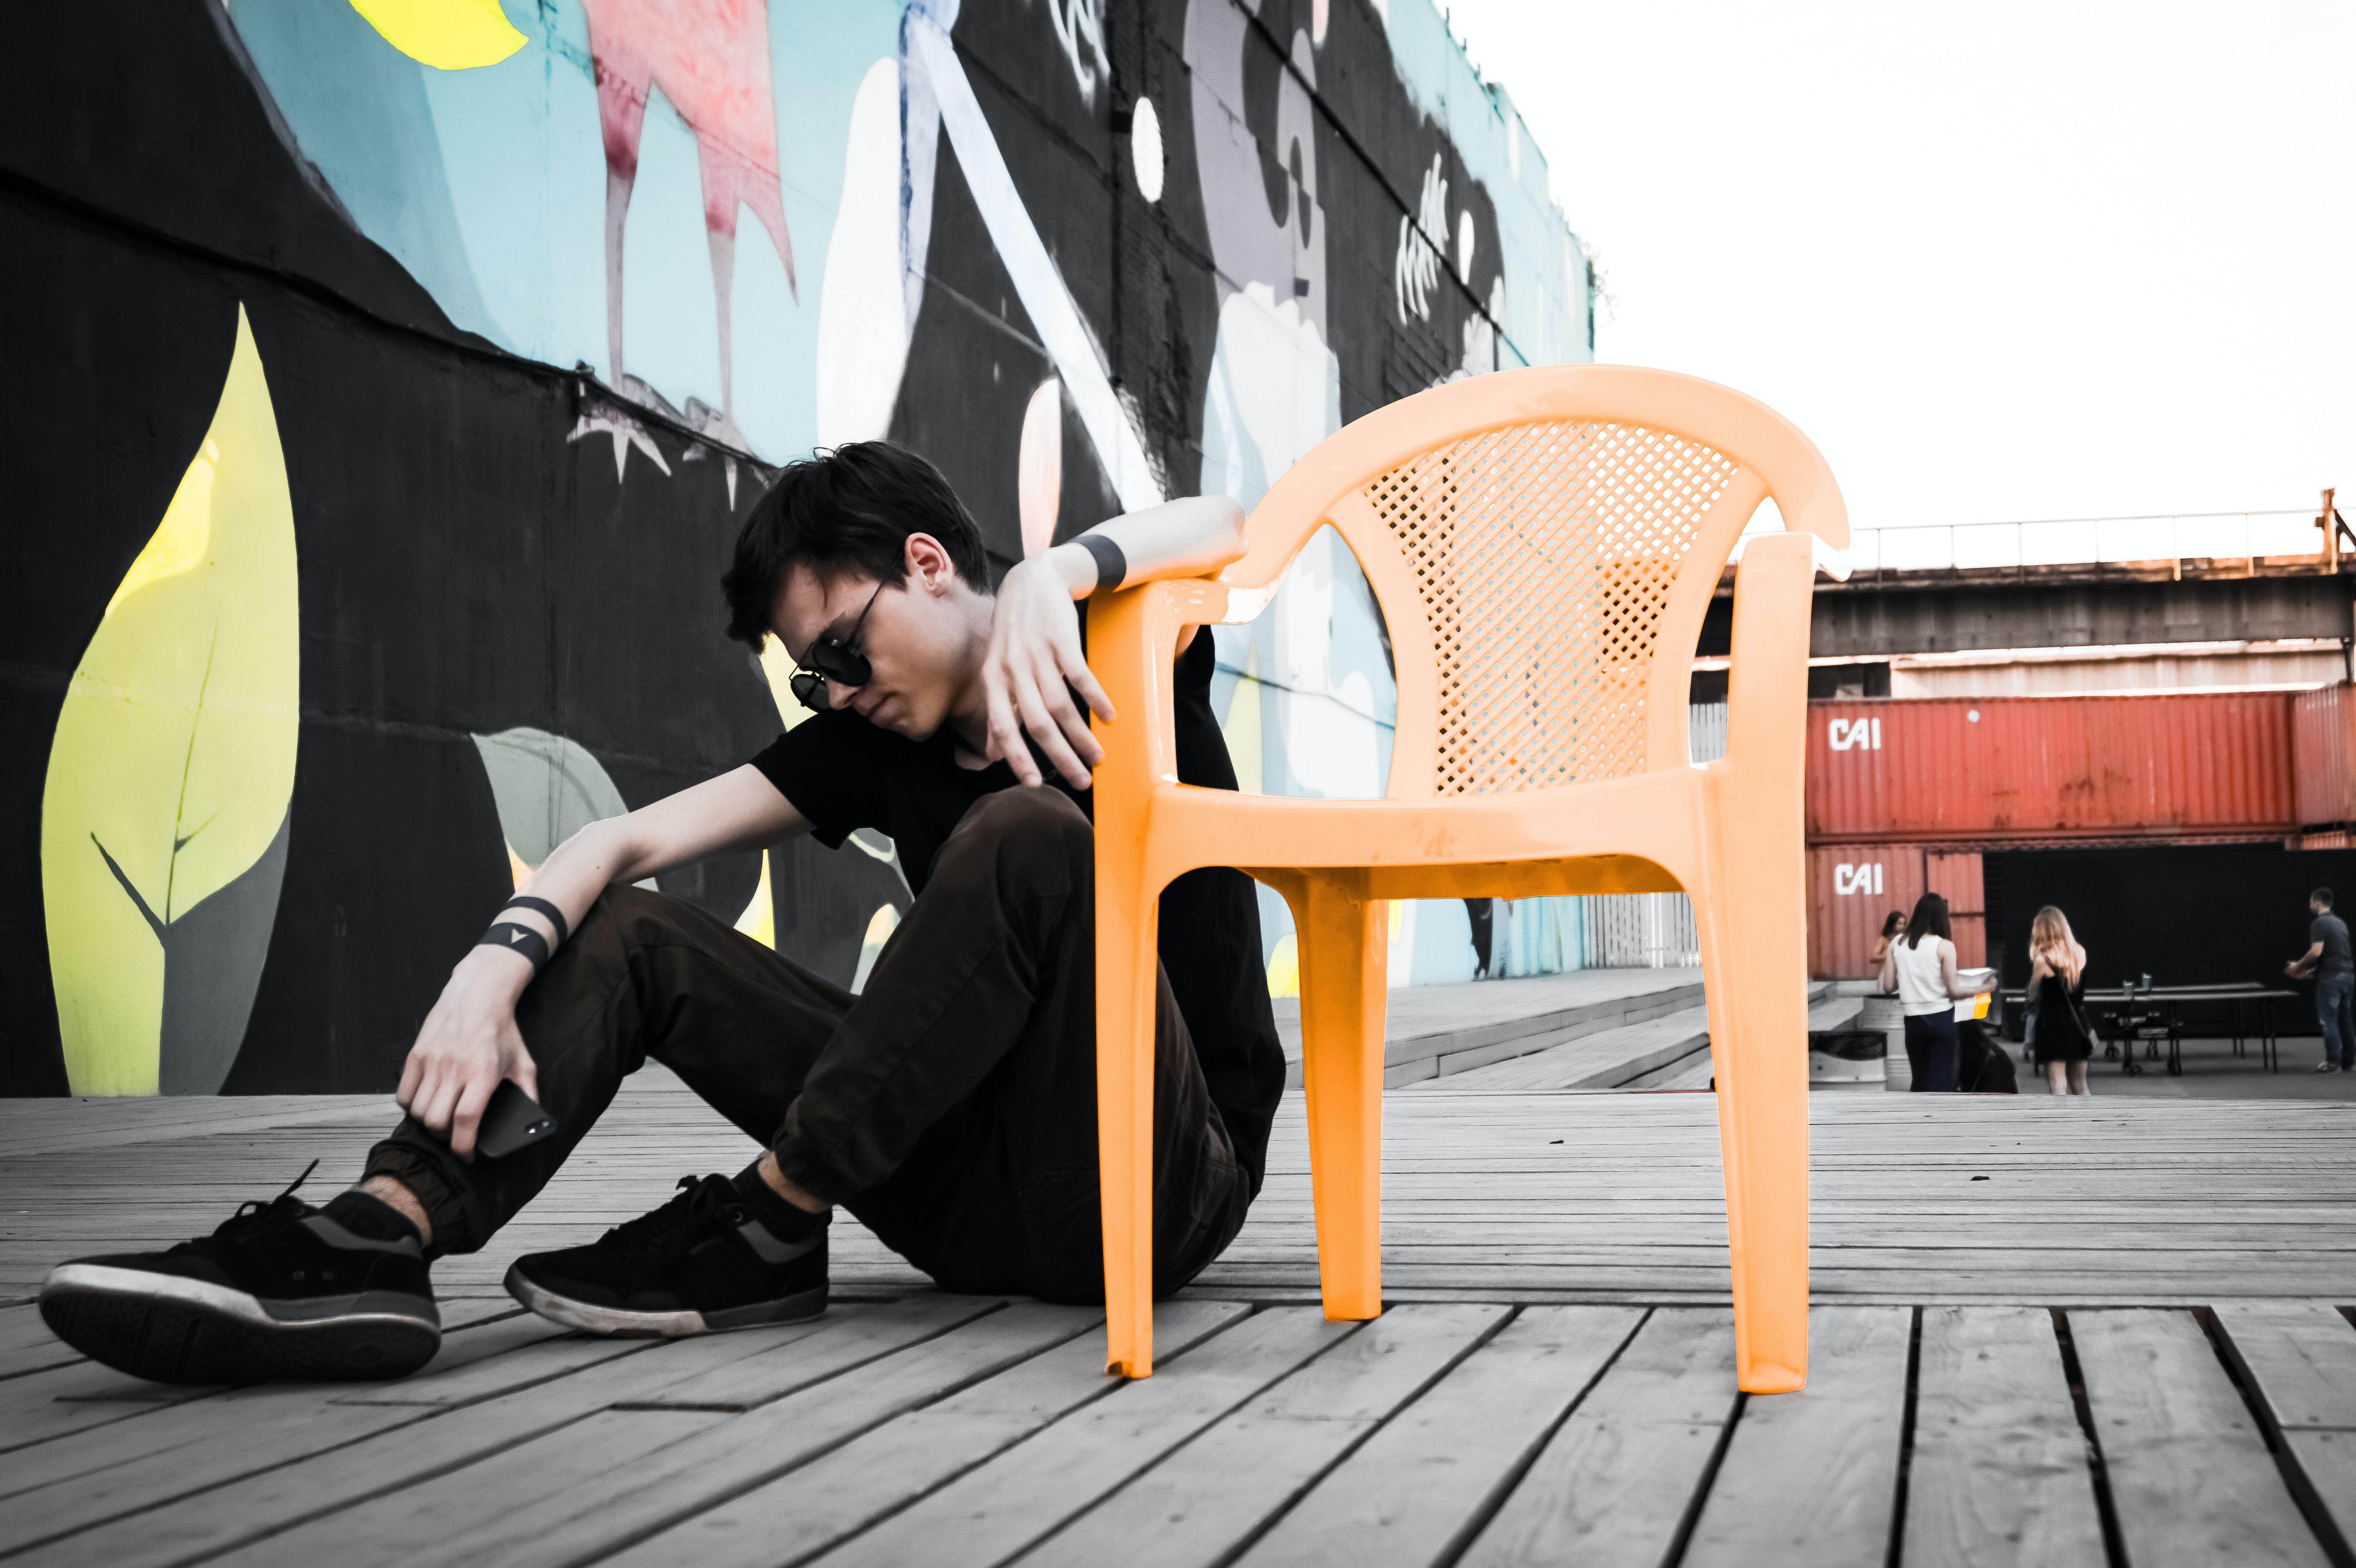 man sitting on floor beside empty orange plastic monobloc armchair at daytime